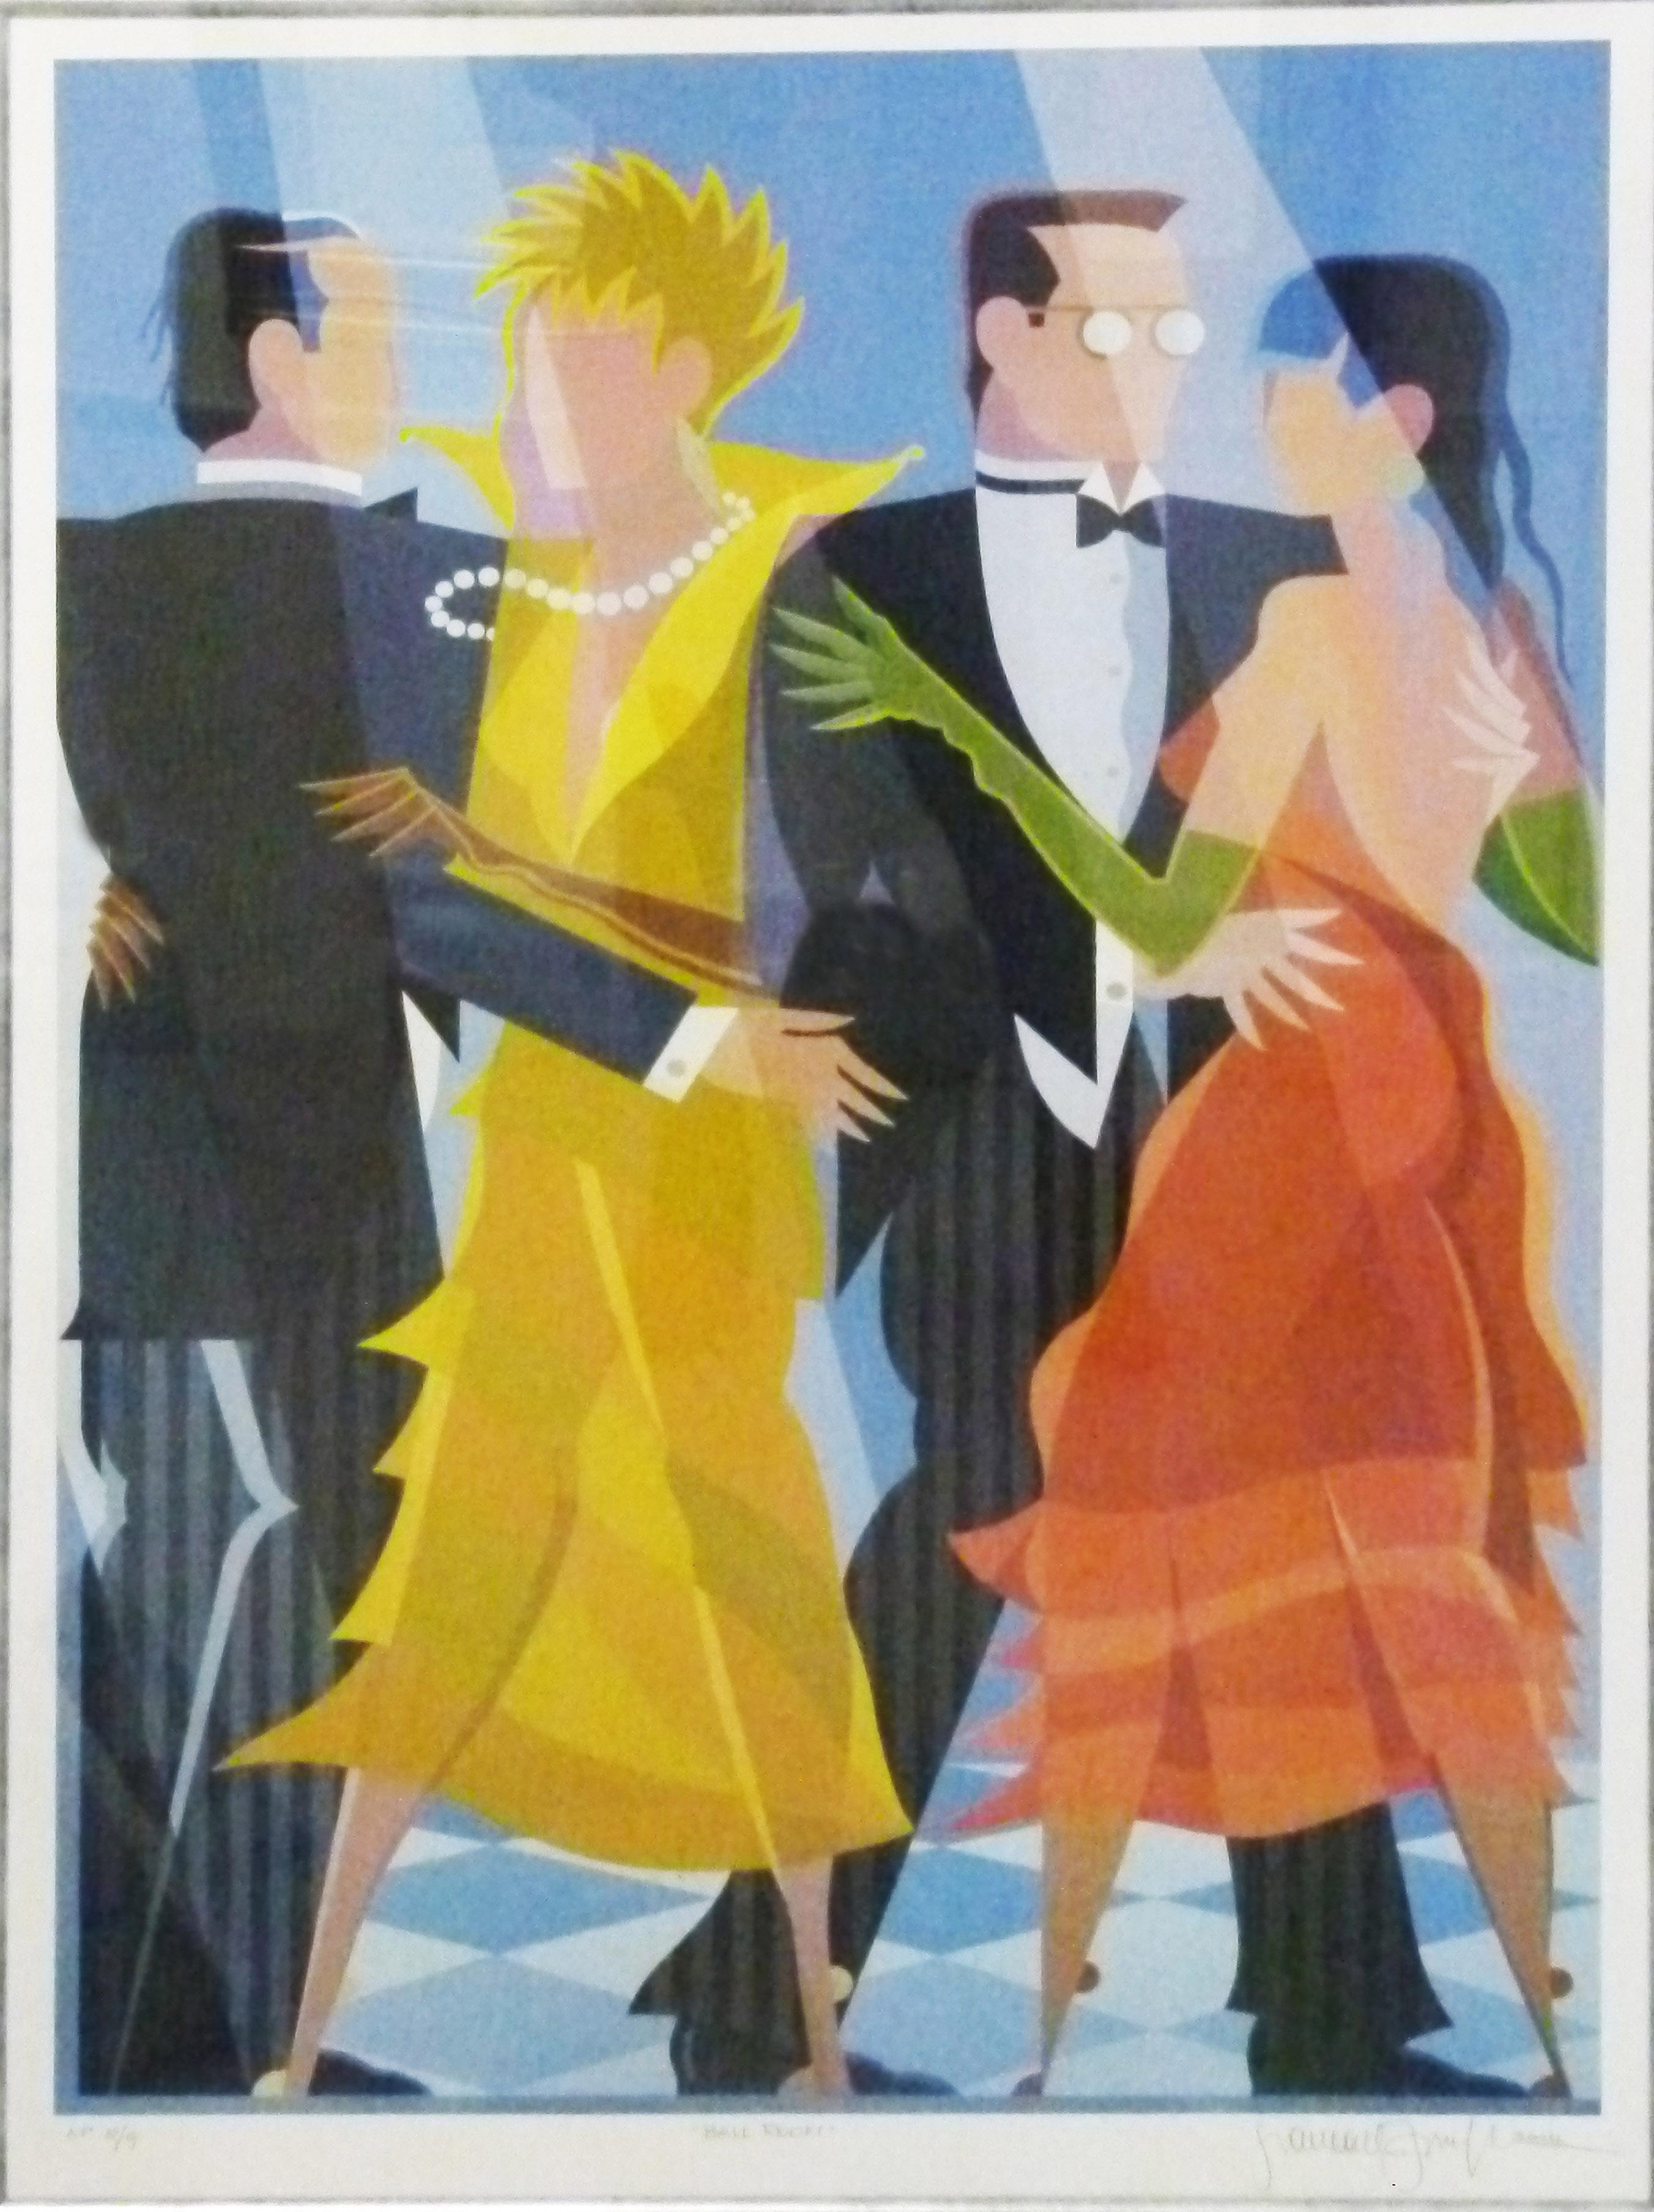 Giancarlo Impiglia, Italian (1940-) Ball Room, 2004, Lithograph signed 8-9, 58cm x 87cm